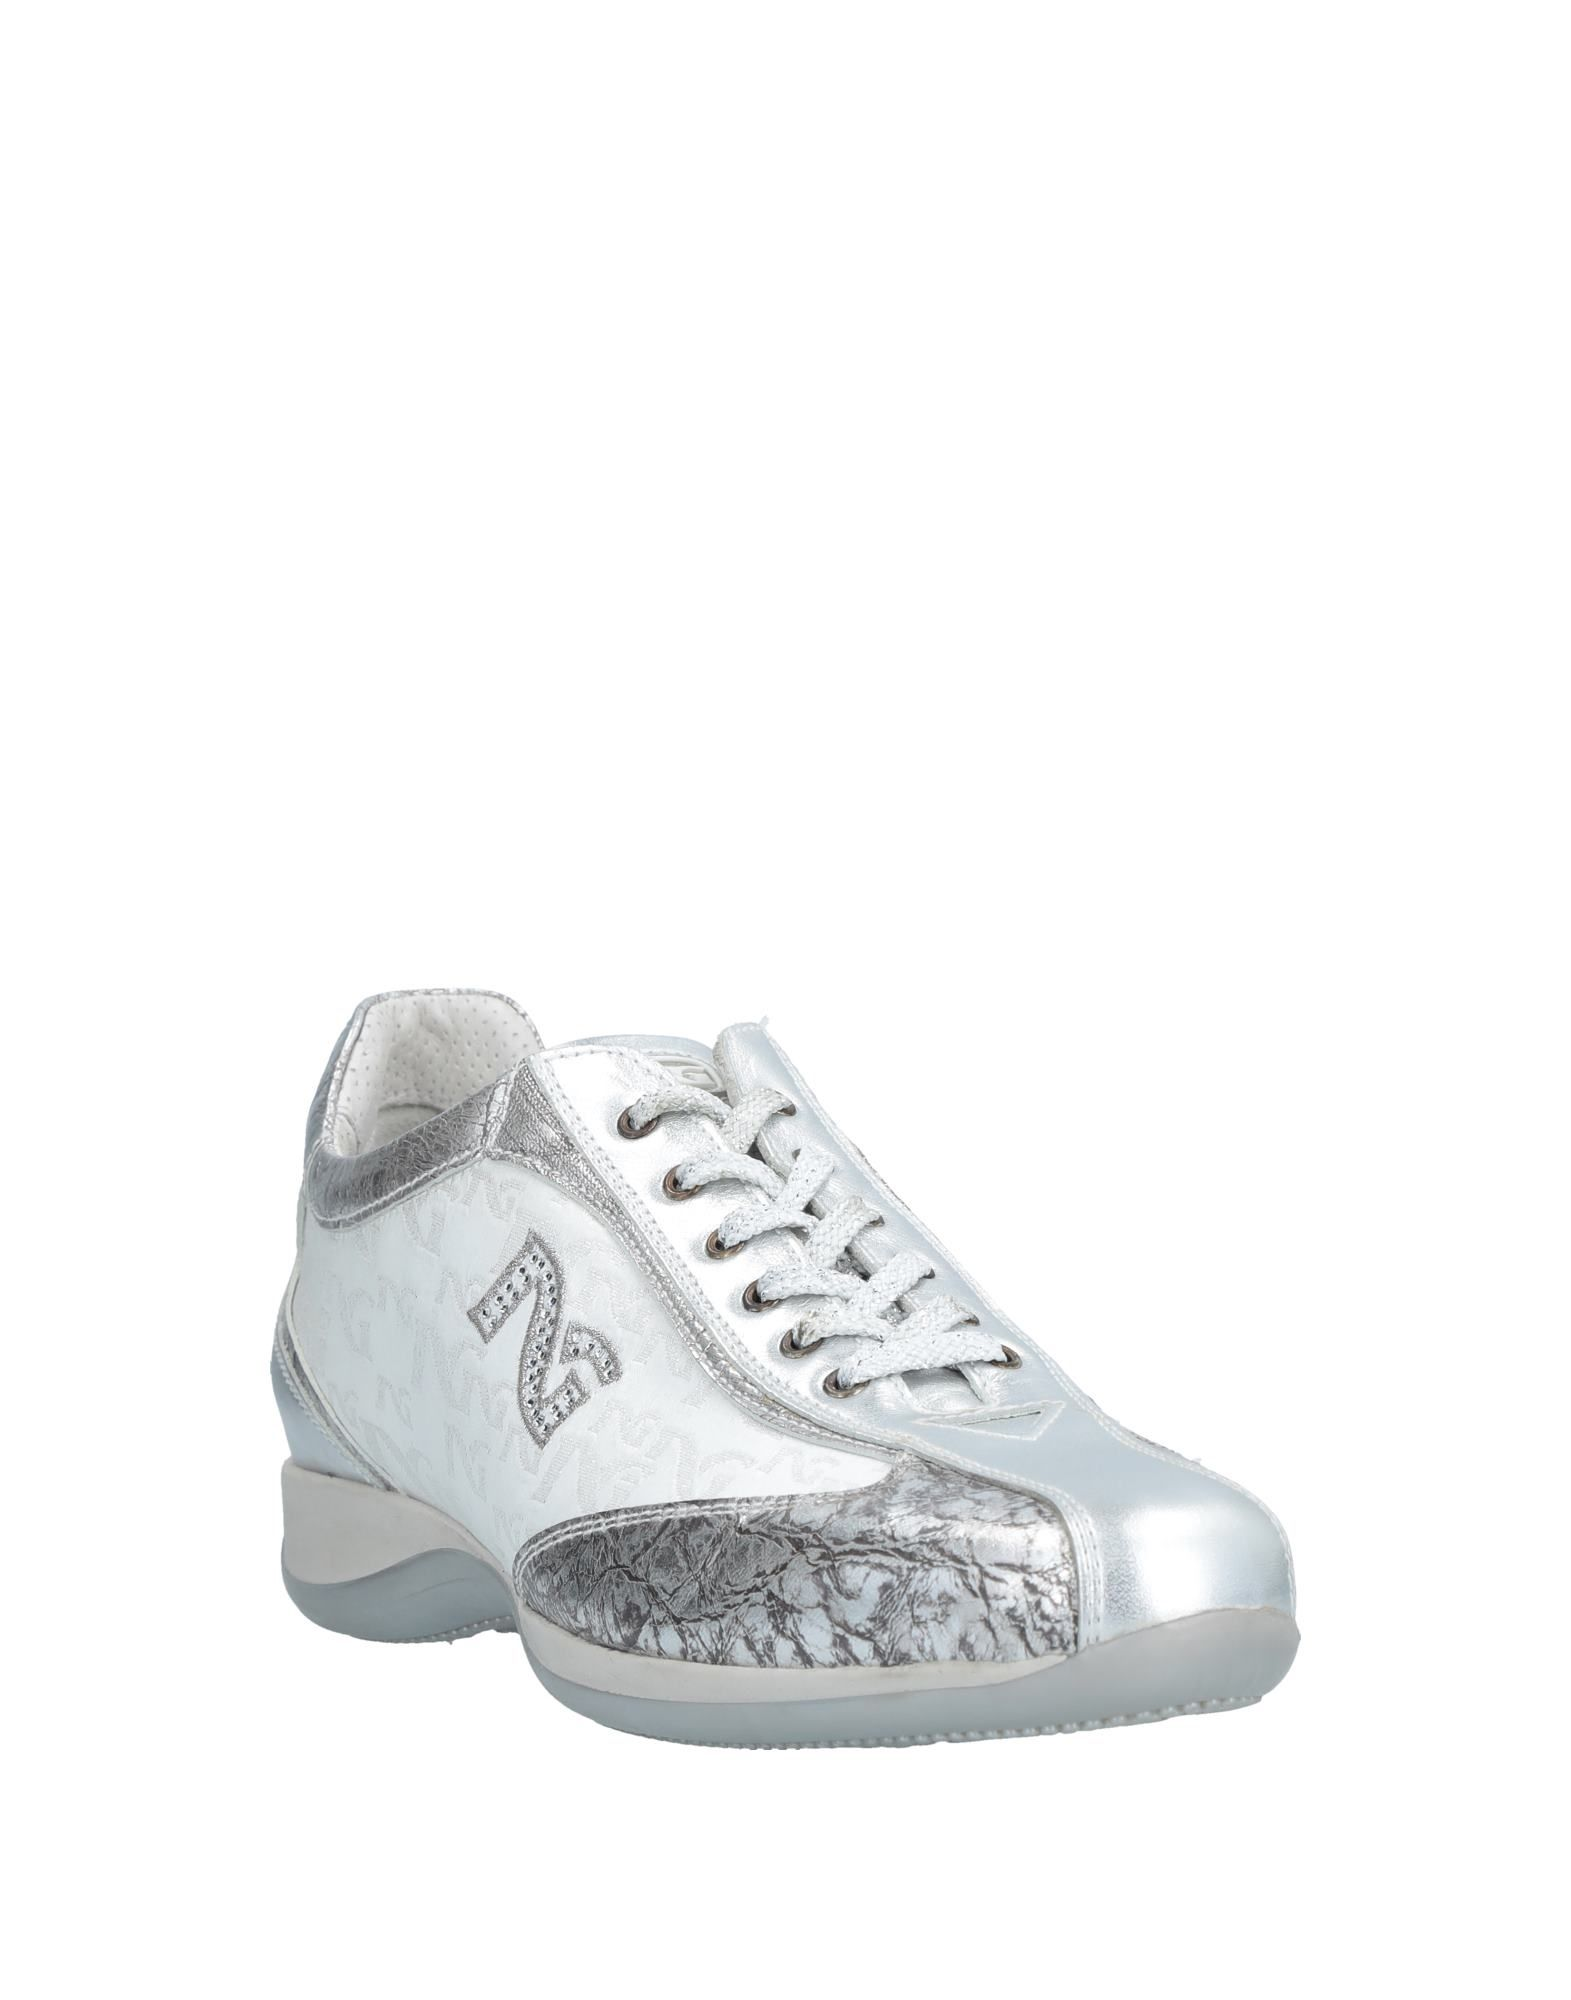 Ng Nero  Giardini Sneakers Damen  Nero 11523253EM Neue Schuhe c6628f